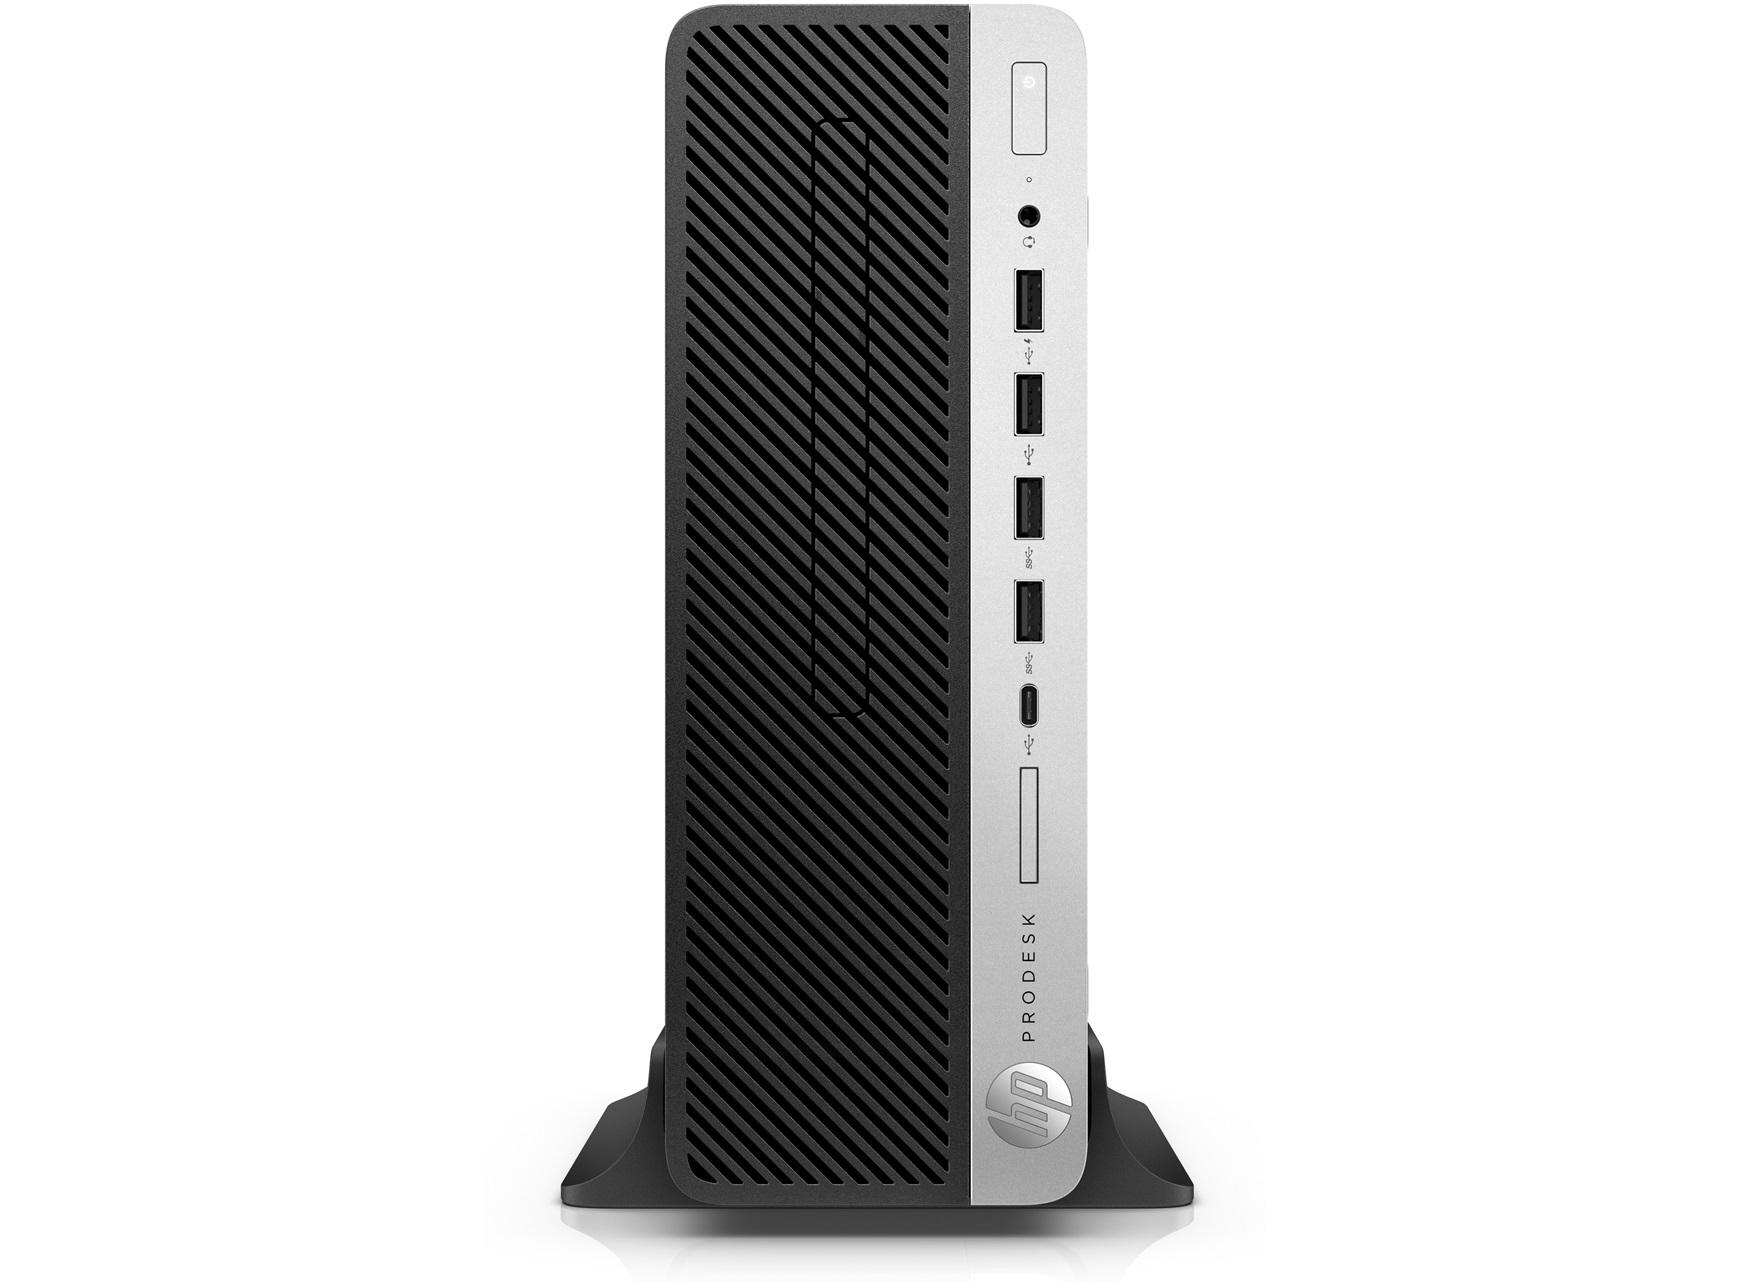 HP ProDesk 600 G4 8th gen Intel® Core™ i5 i5-8500 8 GB DDR4-SDRAM 256 GB SSD Black,Silver SFF PC